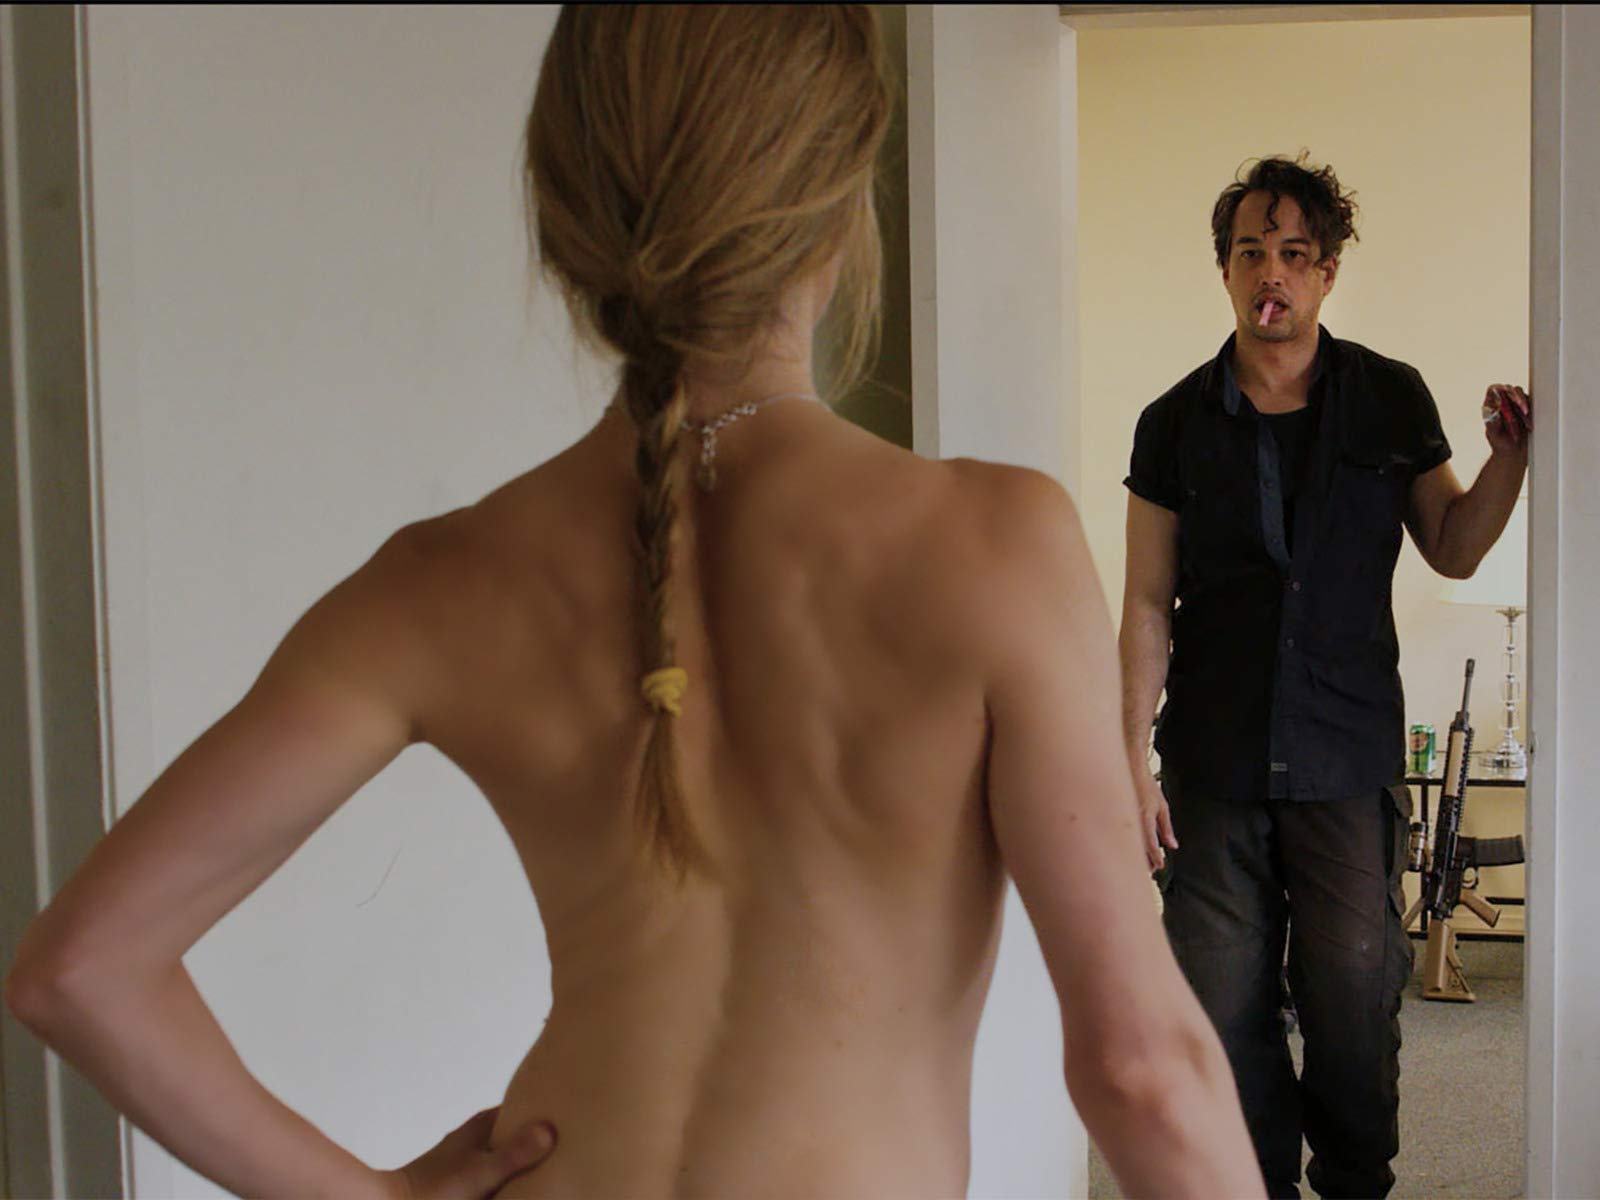 David and Olivia? - Naked in Scotland - Season 2